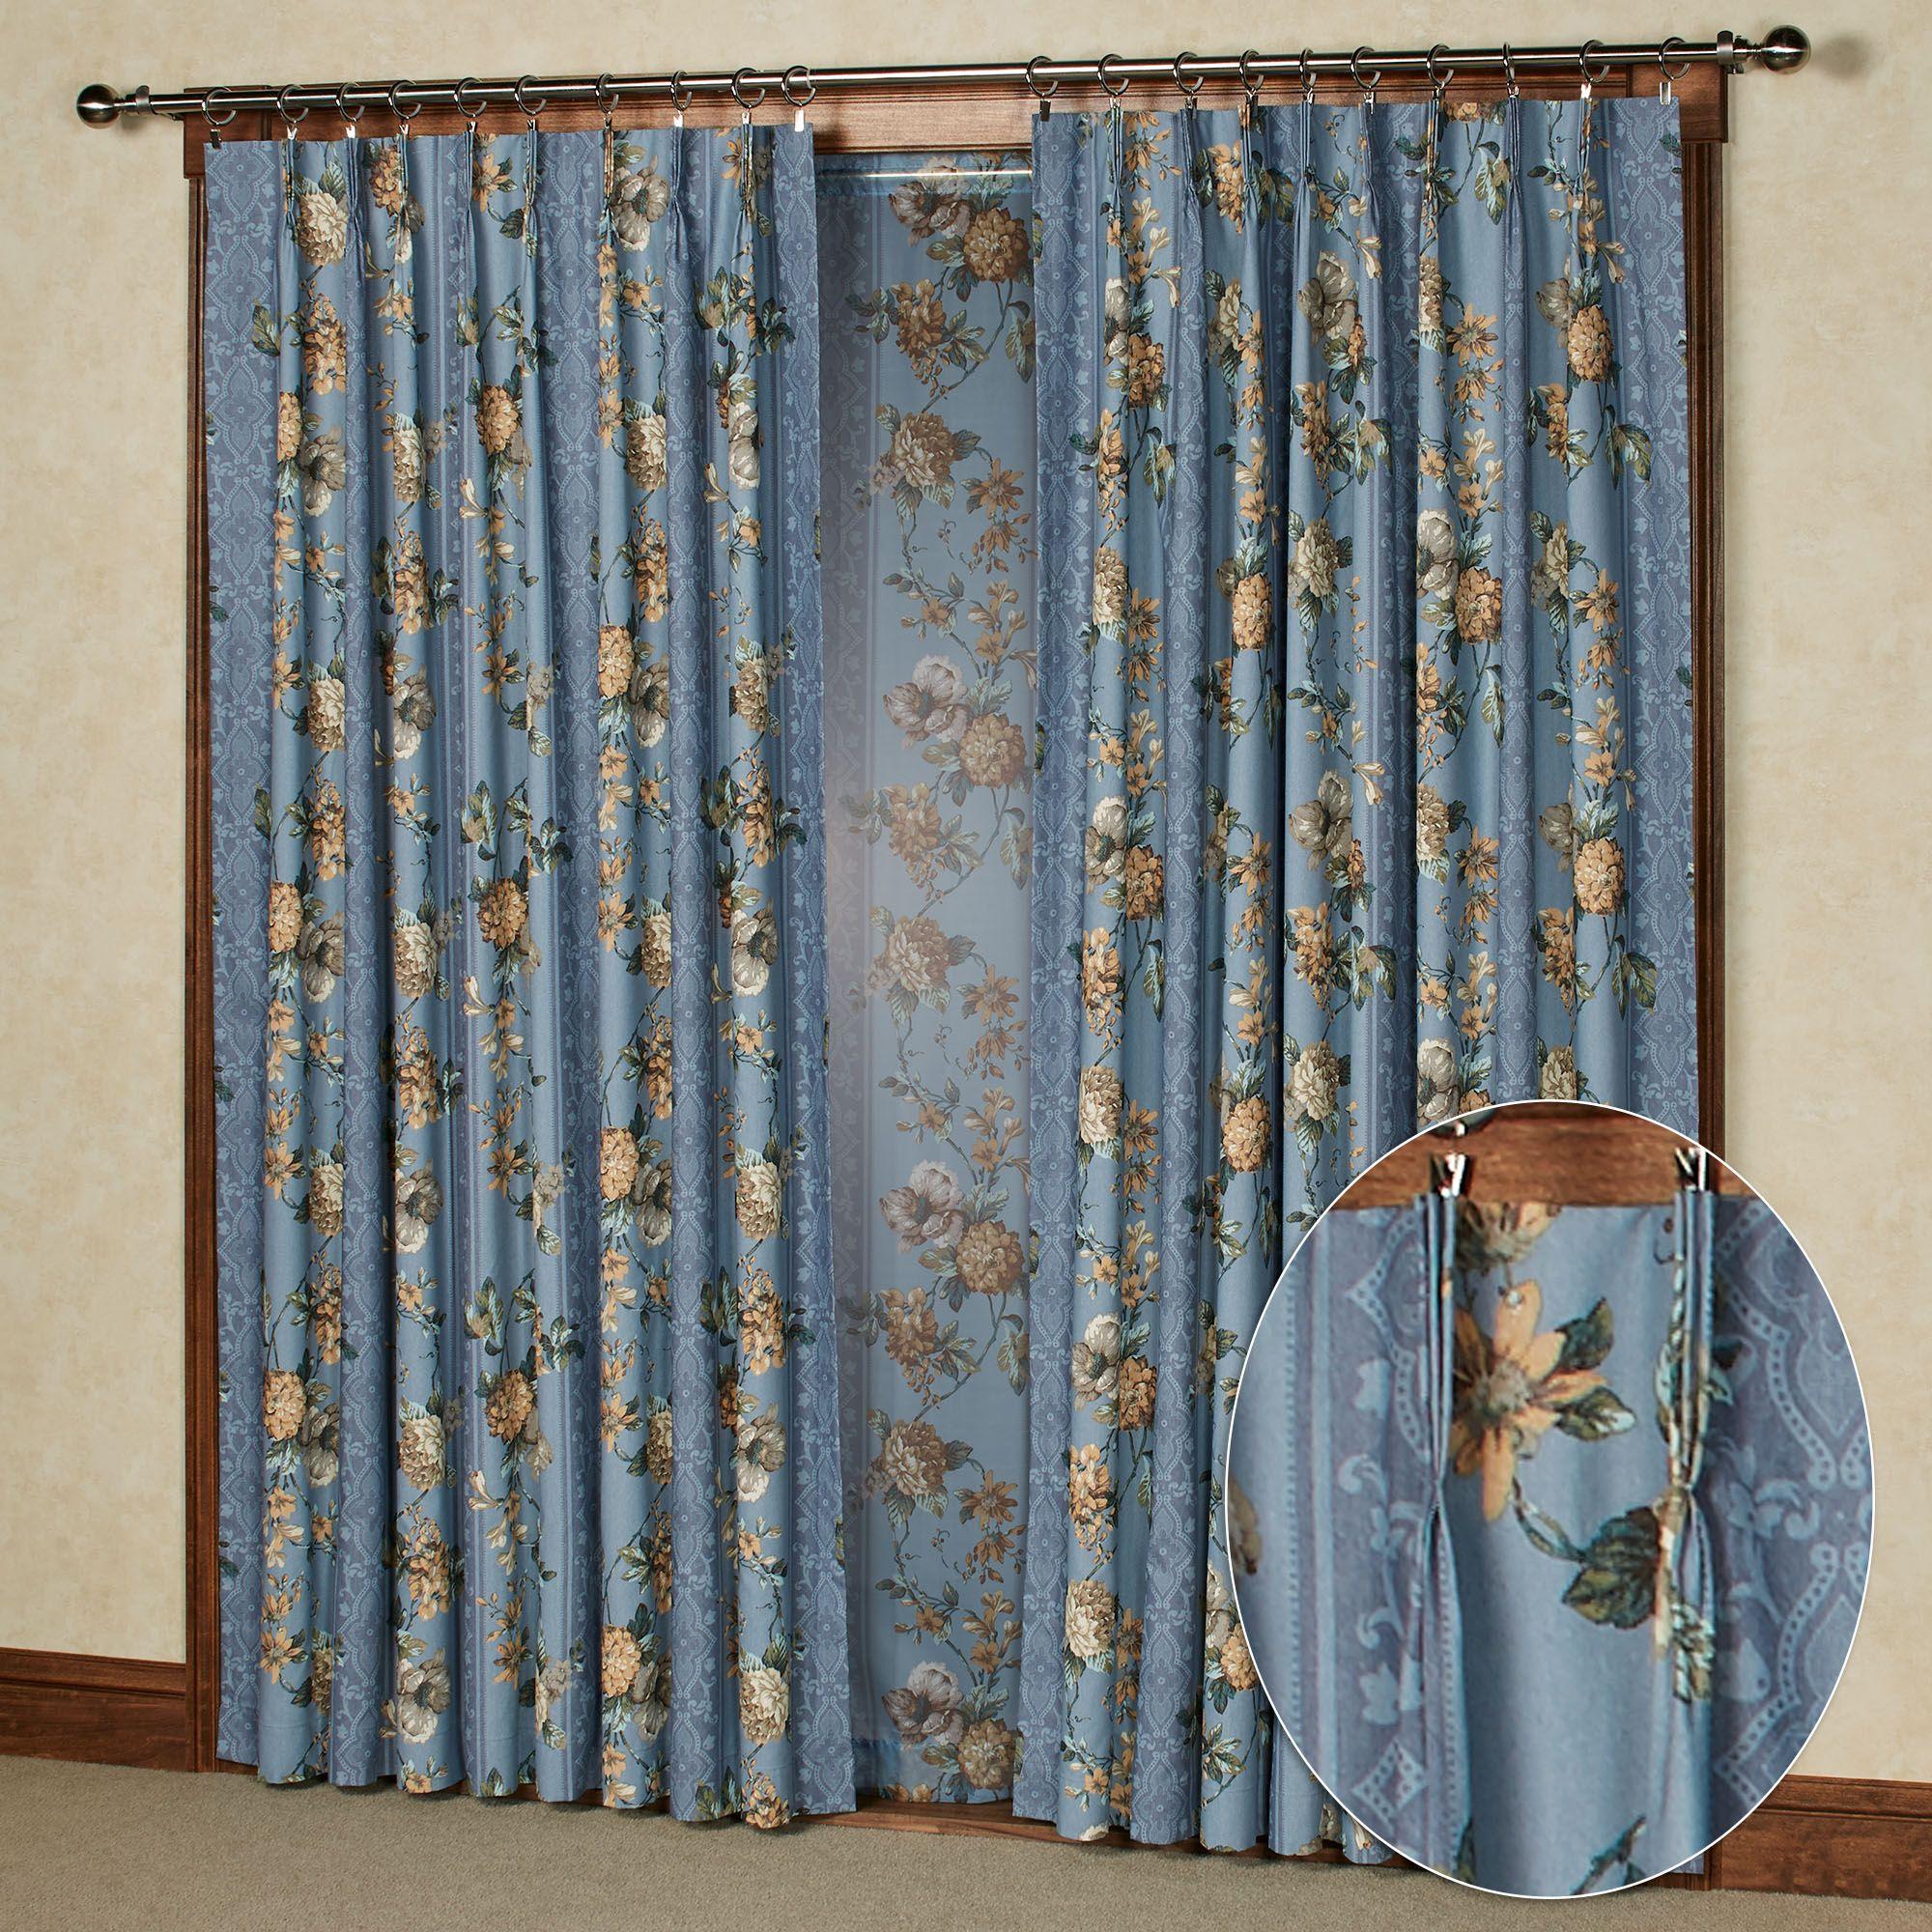 Birkhall Floral Room Darkening Pinch Pleat Curtain Window Treatment